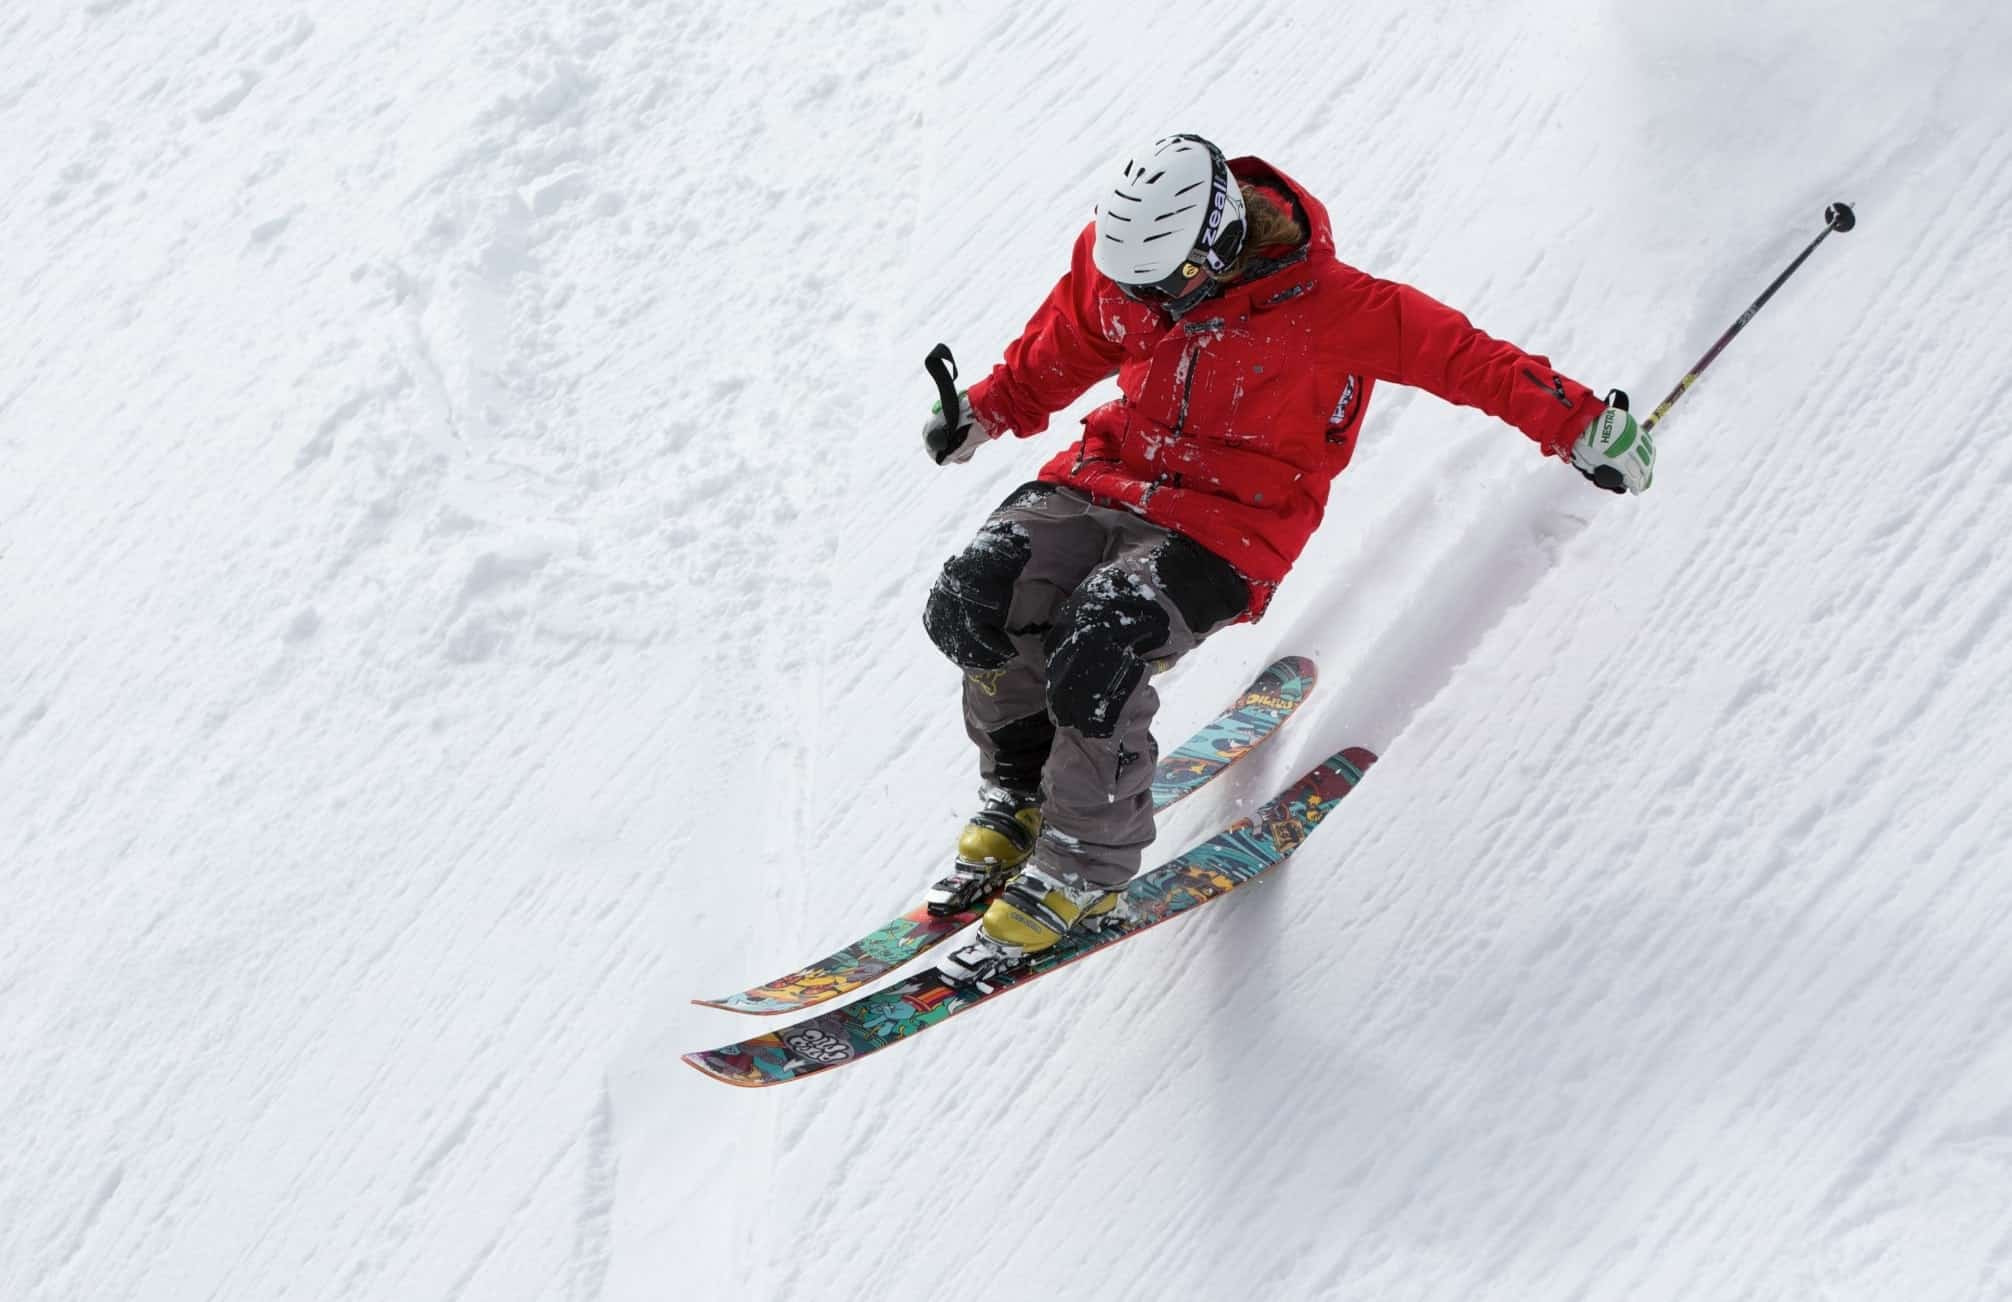 Skier in red skiing down steep slode